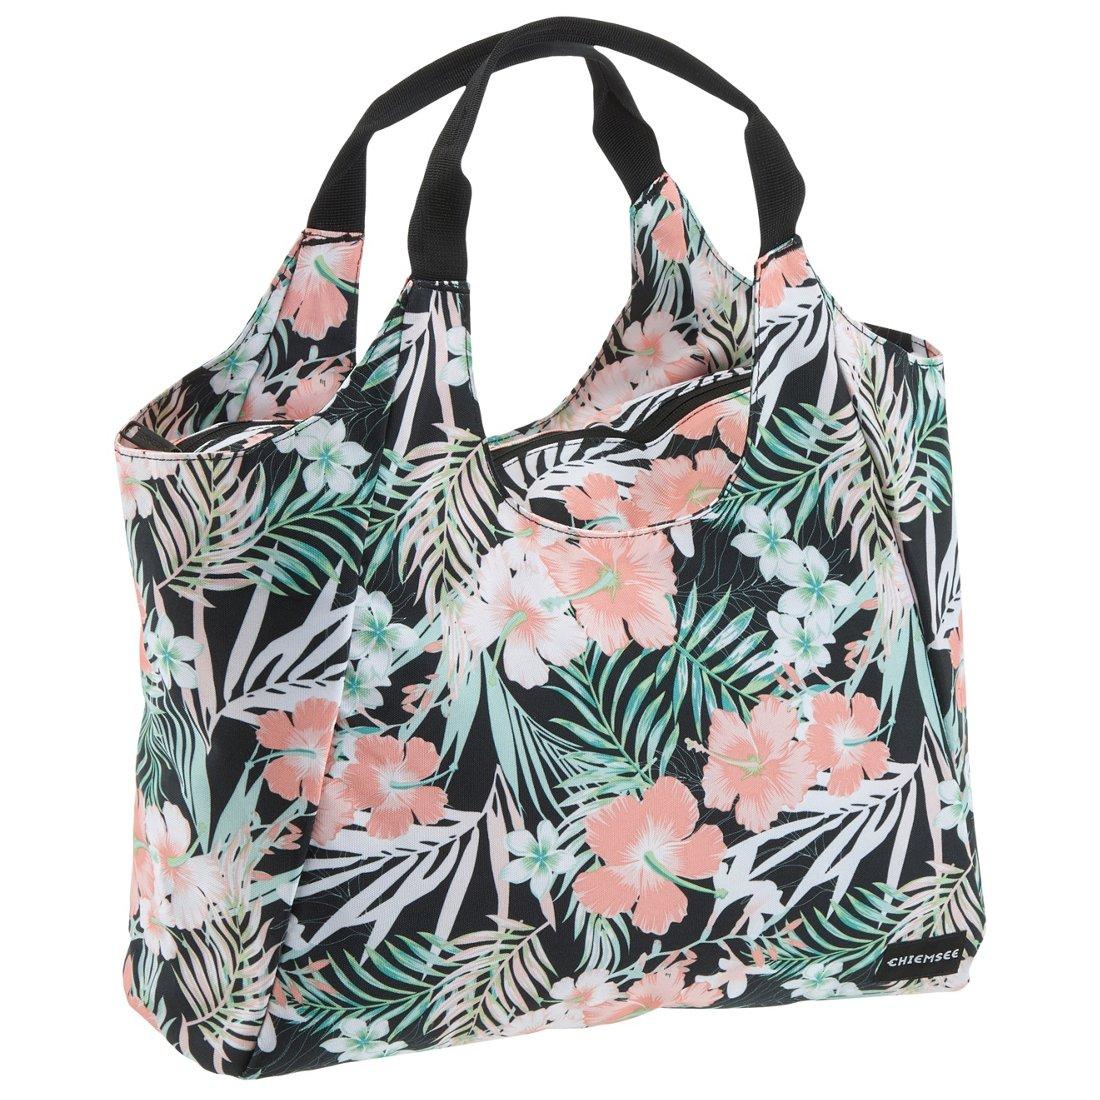 2831ffad069bd Chiemsee Sports   Travel Bags Beachbag 42 cm - koffer-direkt.de